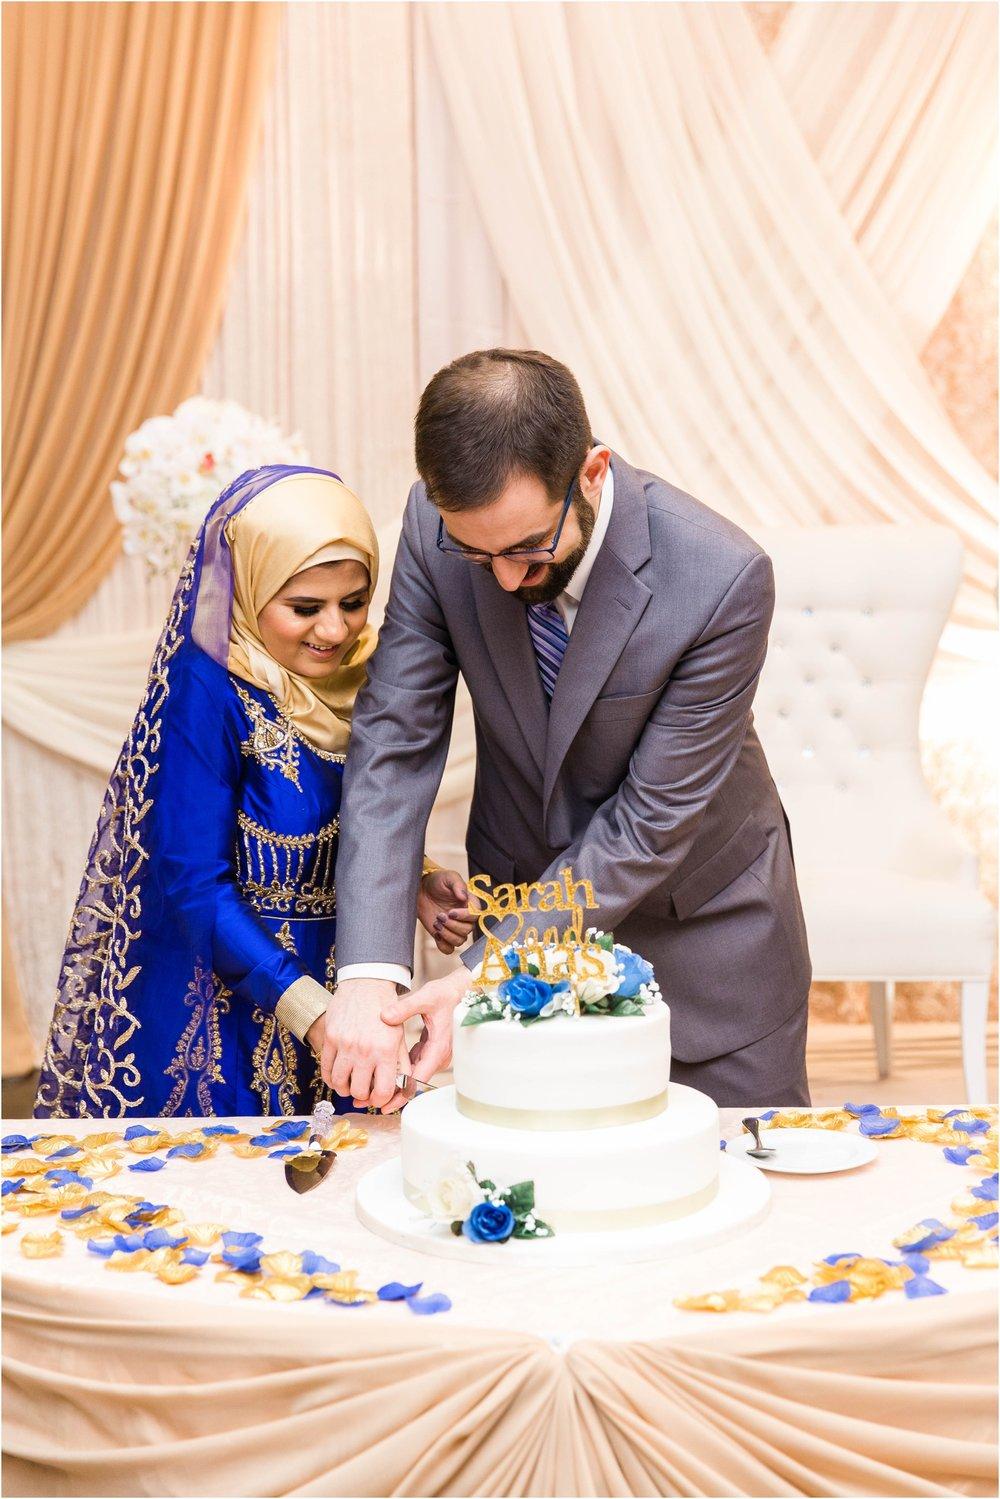 Estate-Banquet-Hall-Wedding-Toronto-Mississauga-Brampton-Scarborough-GTA-Pakistani-Indian-Wedding-Engagement-Photographer-Photography_0053.jpg